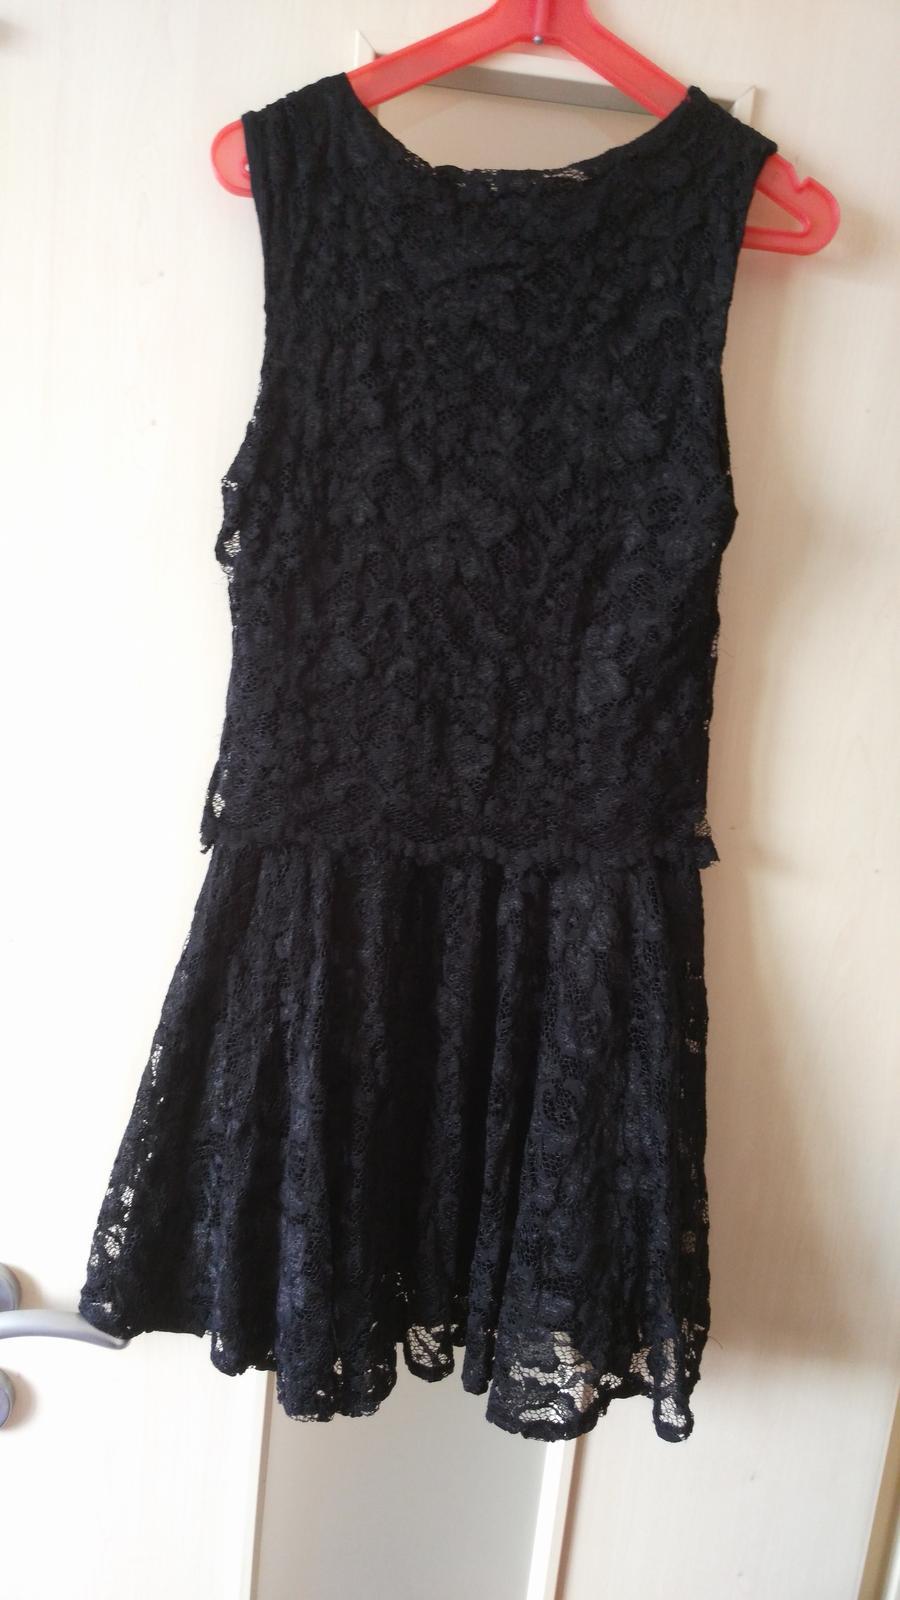 c873ebe5f6e4 Čierne čipkované šaty 38 m